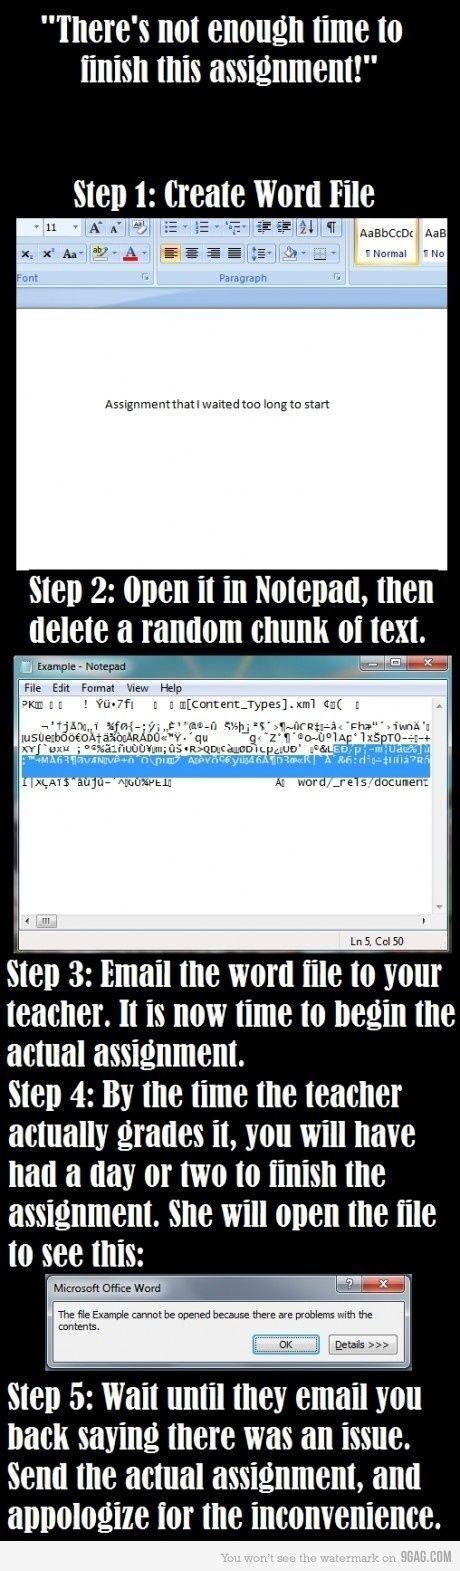 Smart. #funny #picture #haha #humor #collegehumor